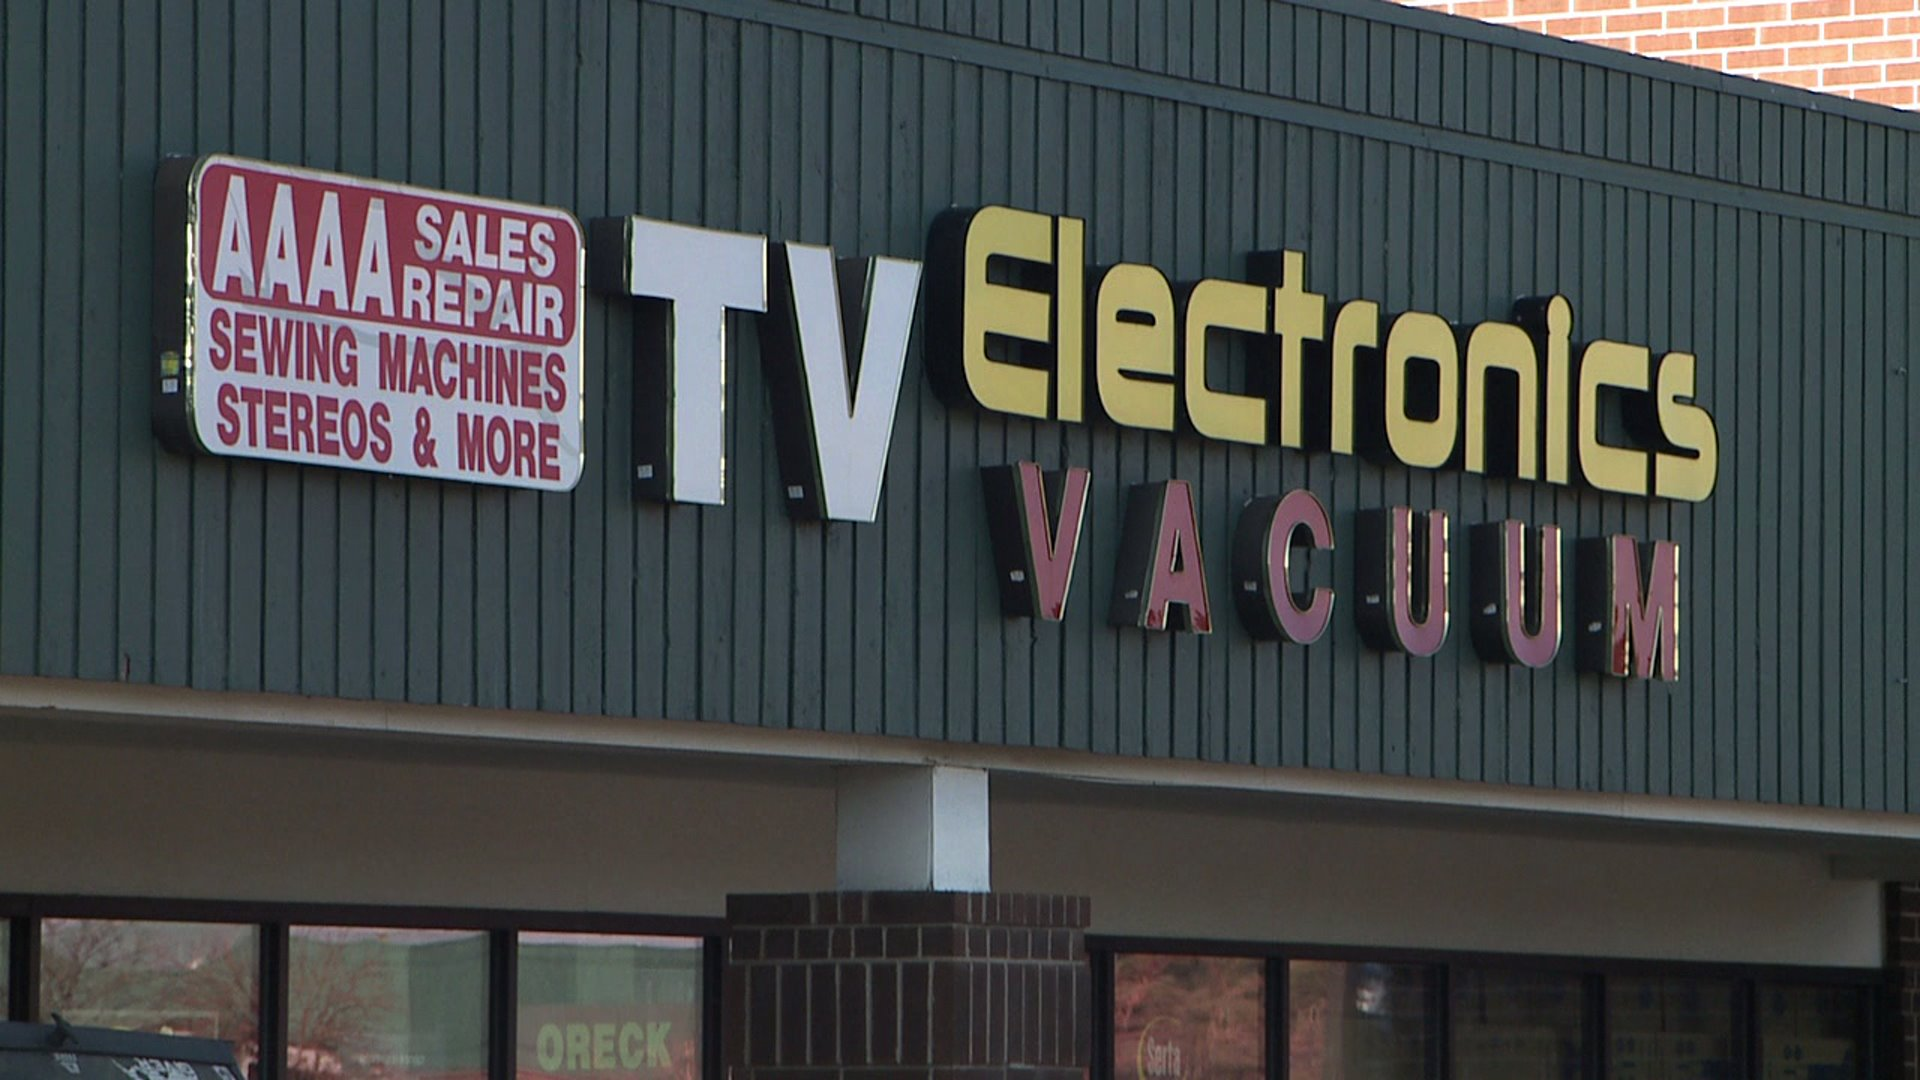 AAAA TV, Electronics and Vacuum